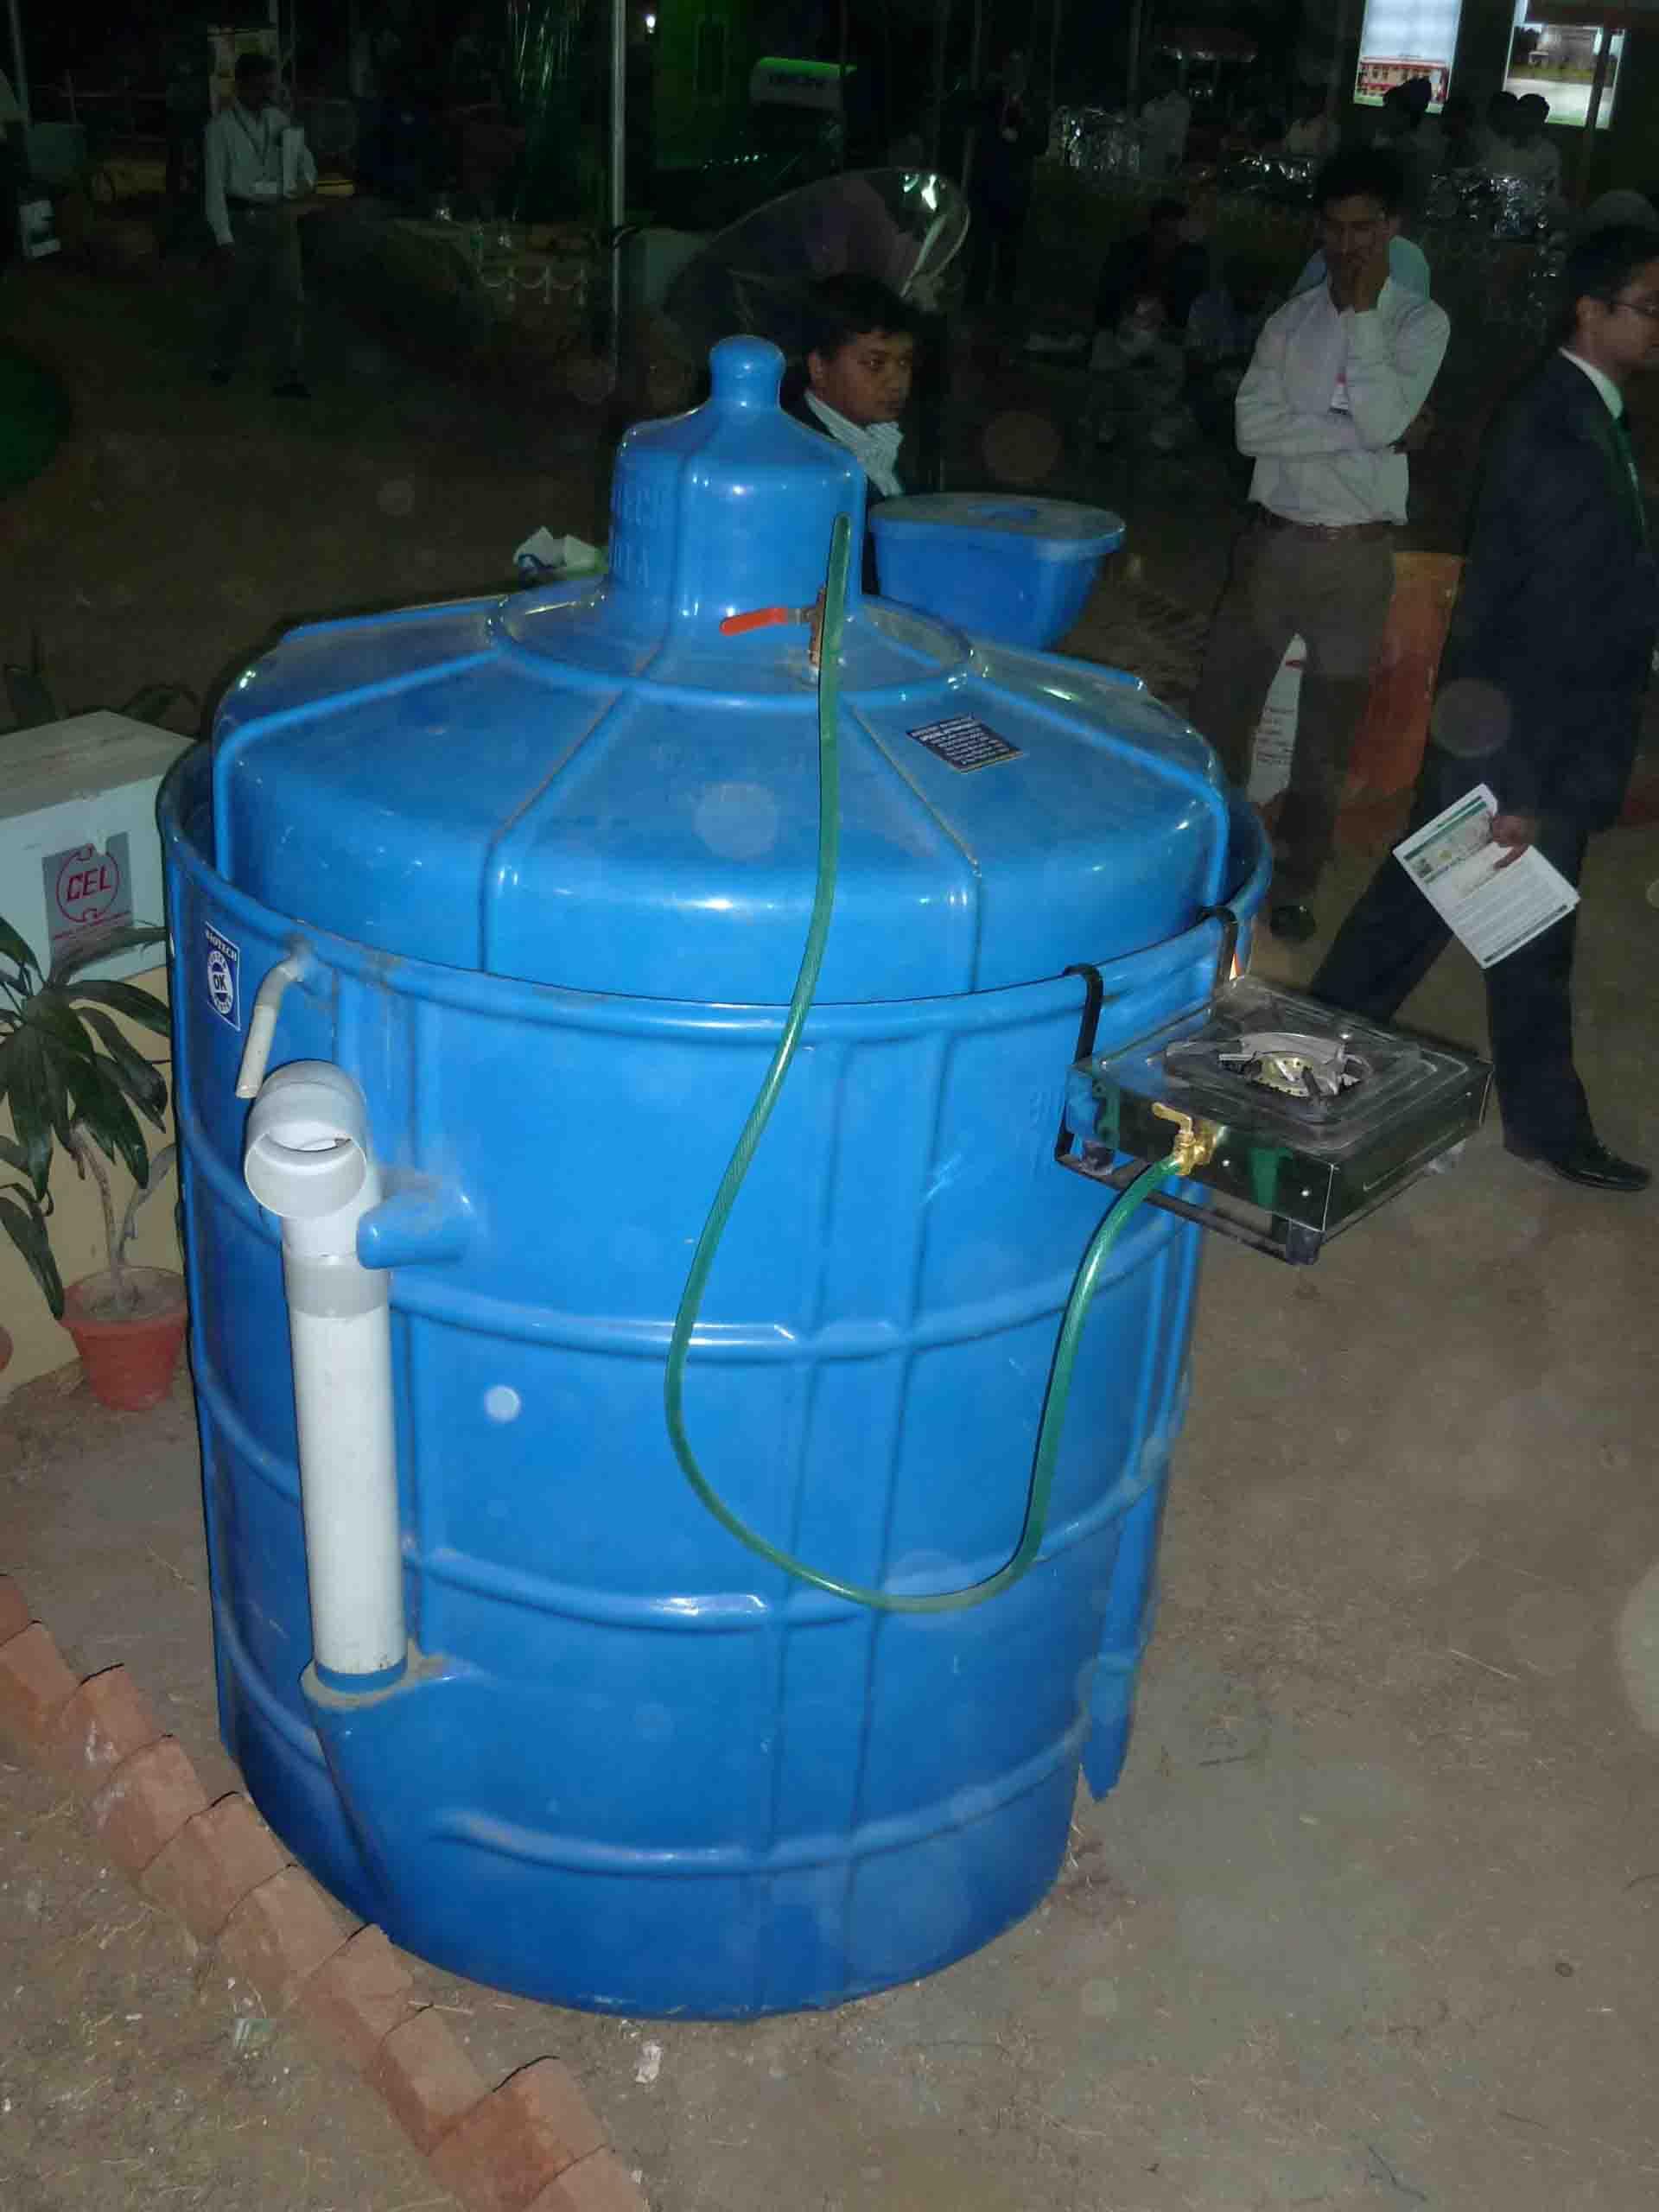 Appareil à biogaz direc 2010 Inde Delhi Oorjaa